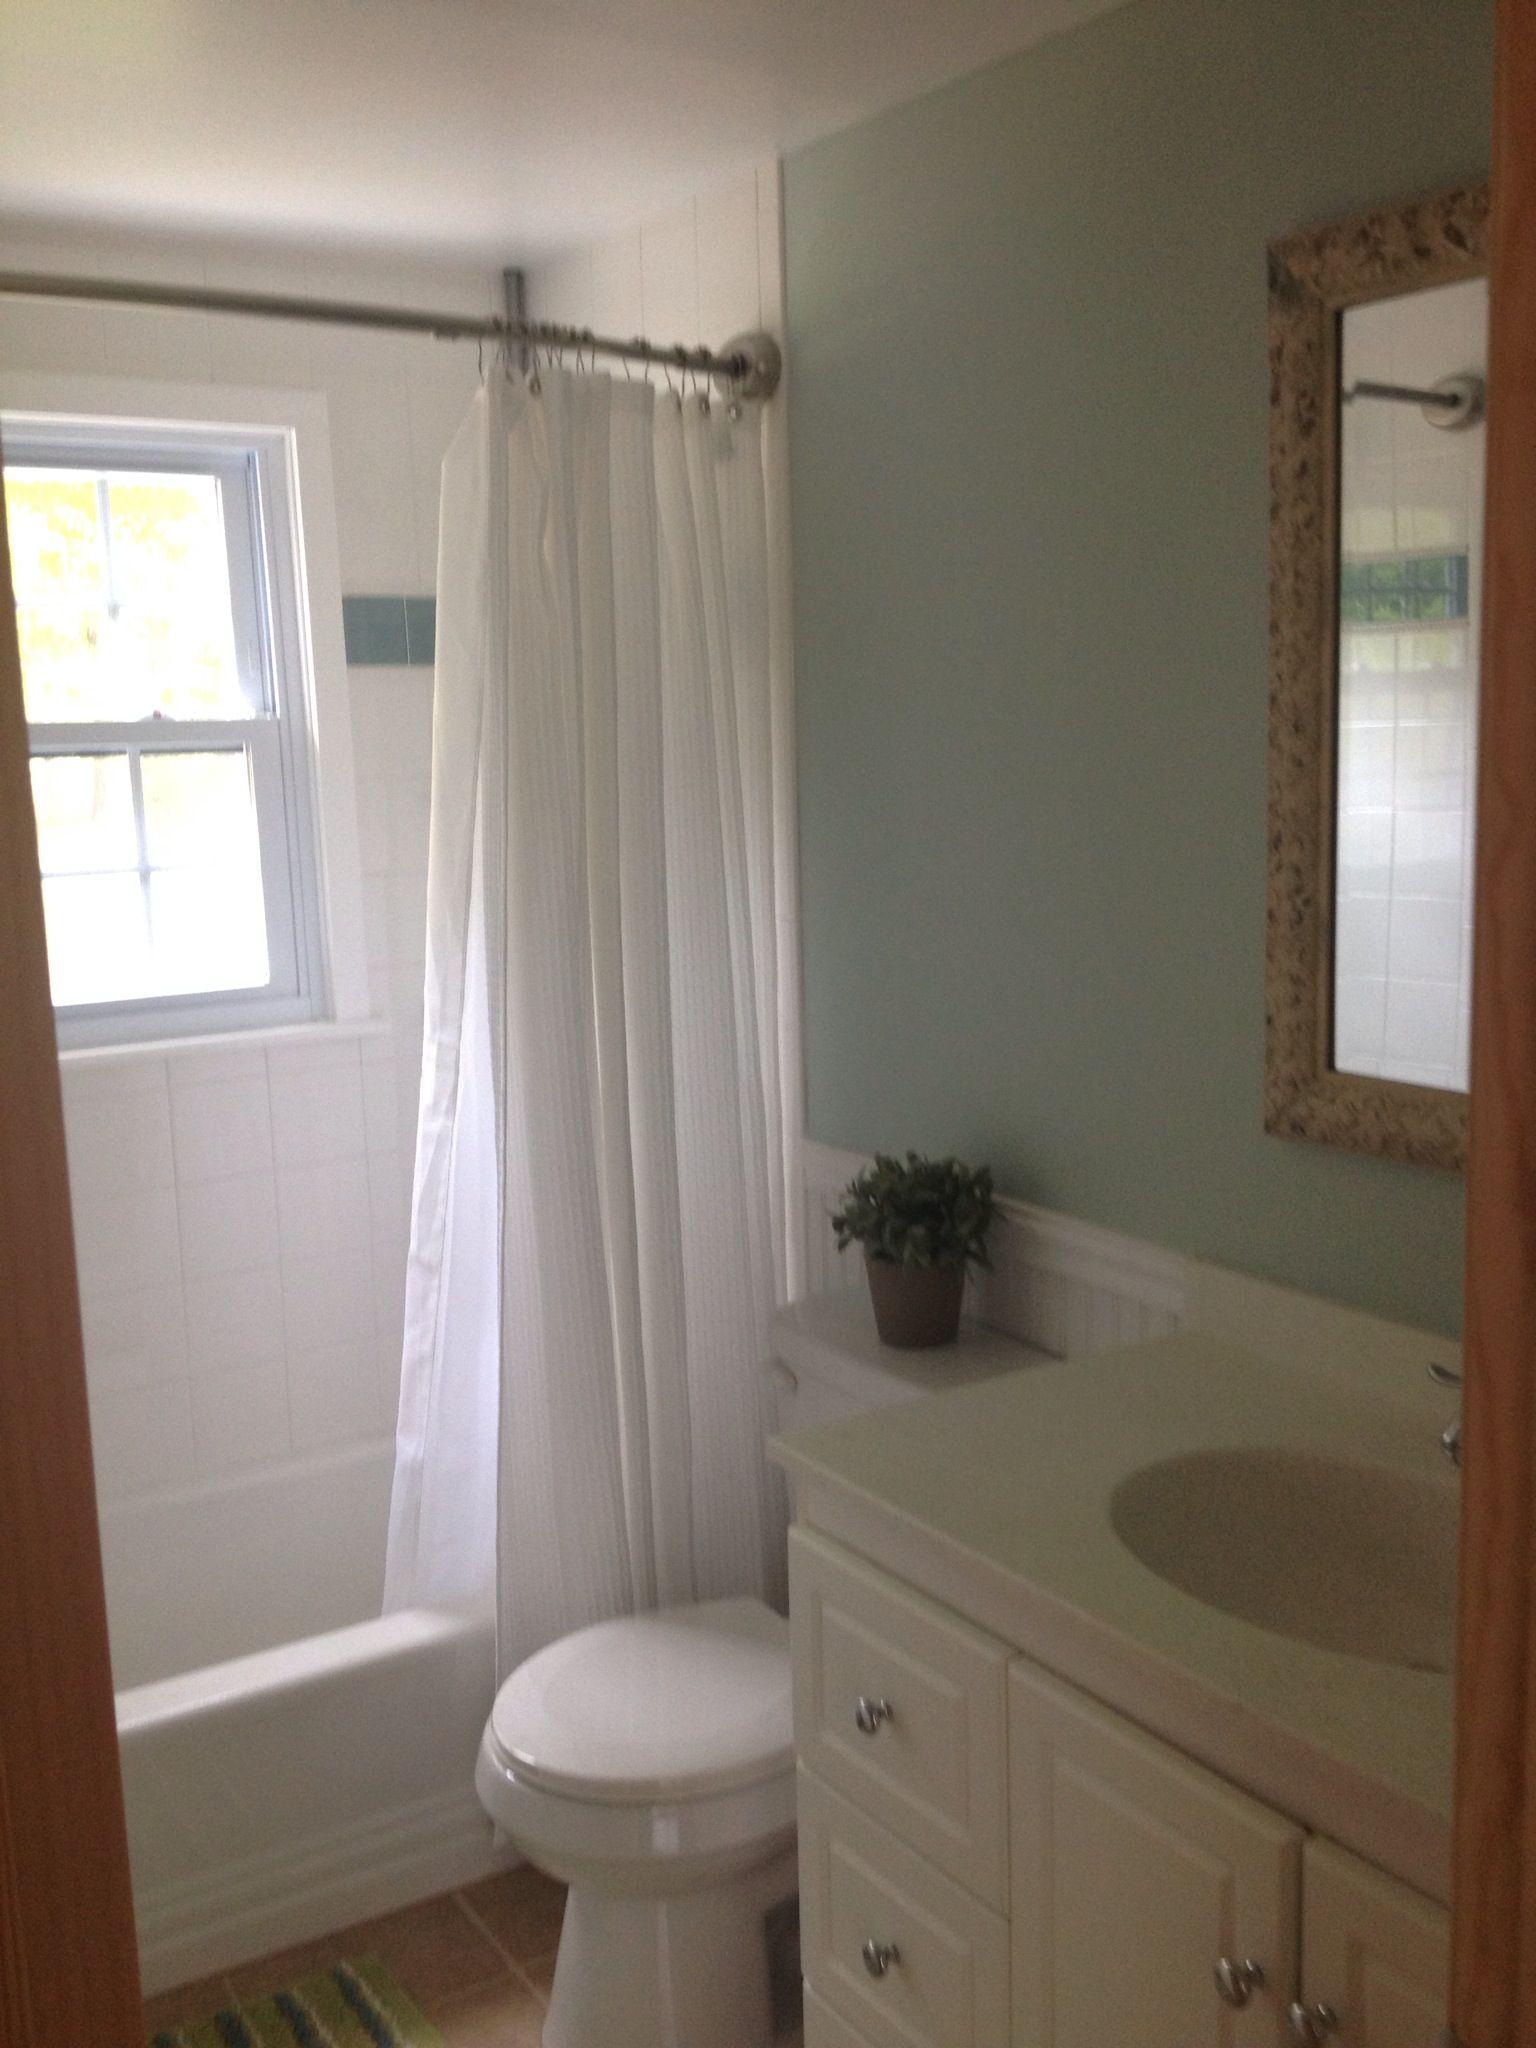 Beach cottage bathroom | Home Decor/ Remodel Ideas | Pinterest